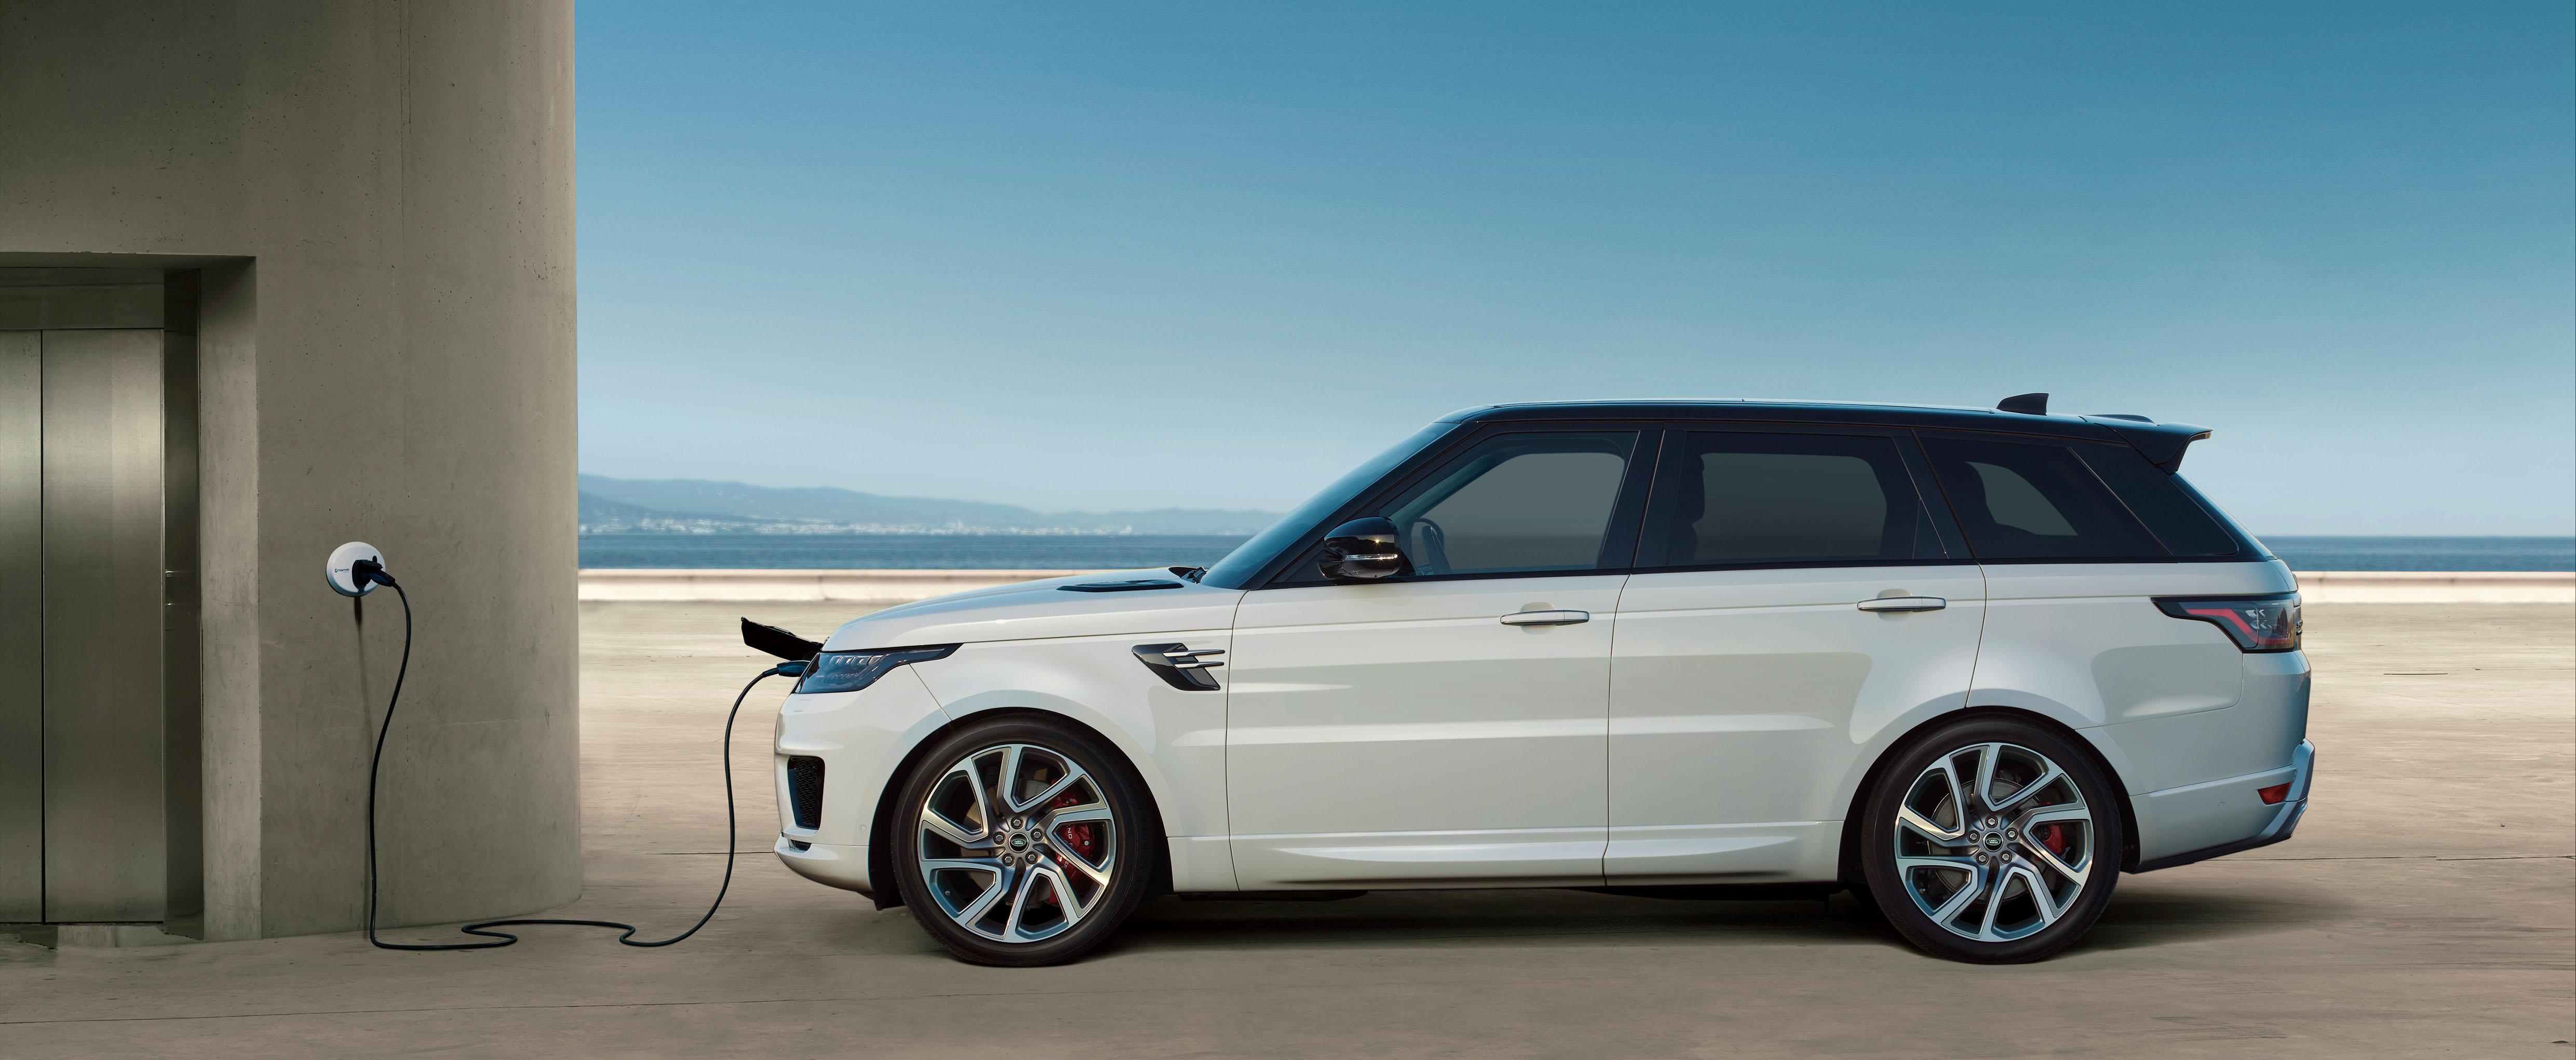 Tudo sobre o novo Range Rover Sport MY18